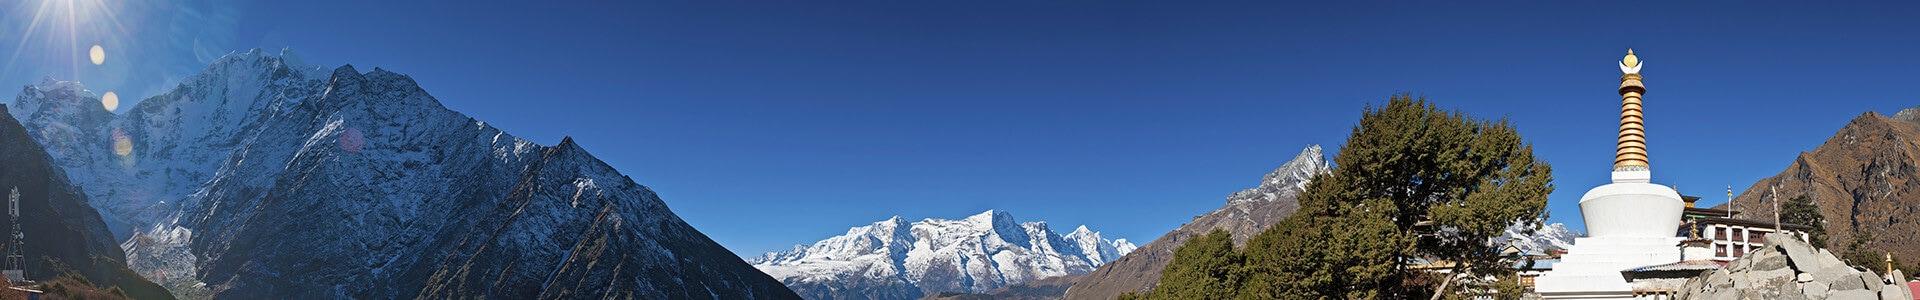 Voyage au Népal - TUI